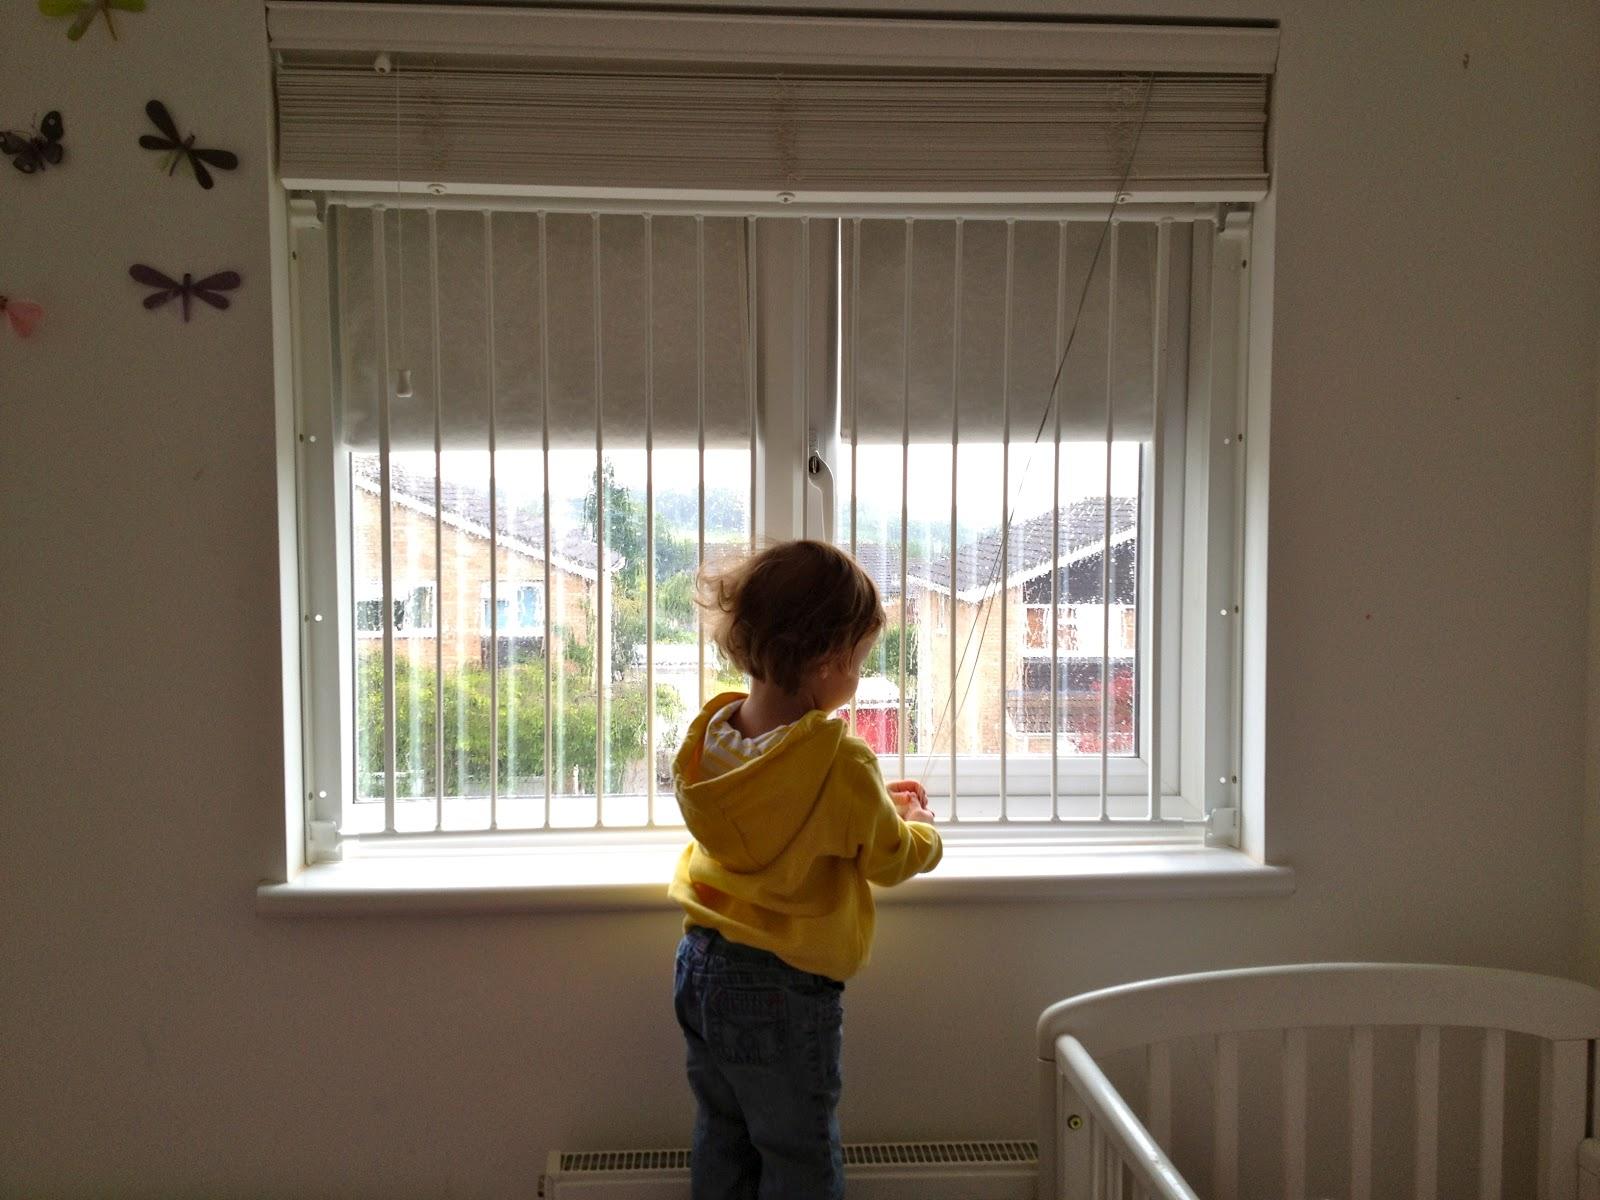 ... SAFE AND SOUND (children's window guards) - Mummy's Little Monkey